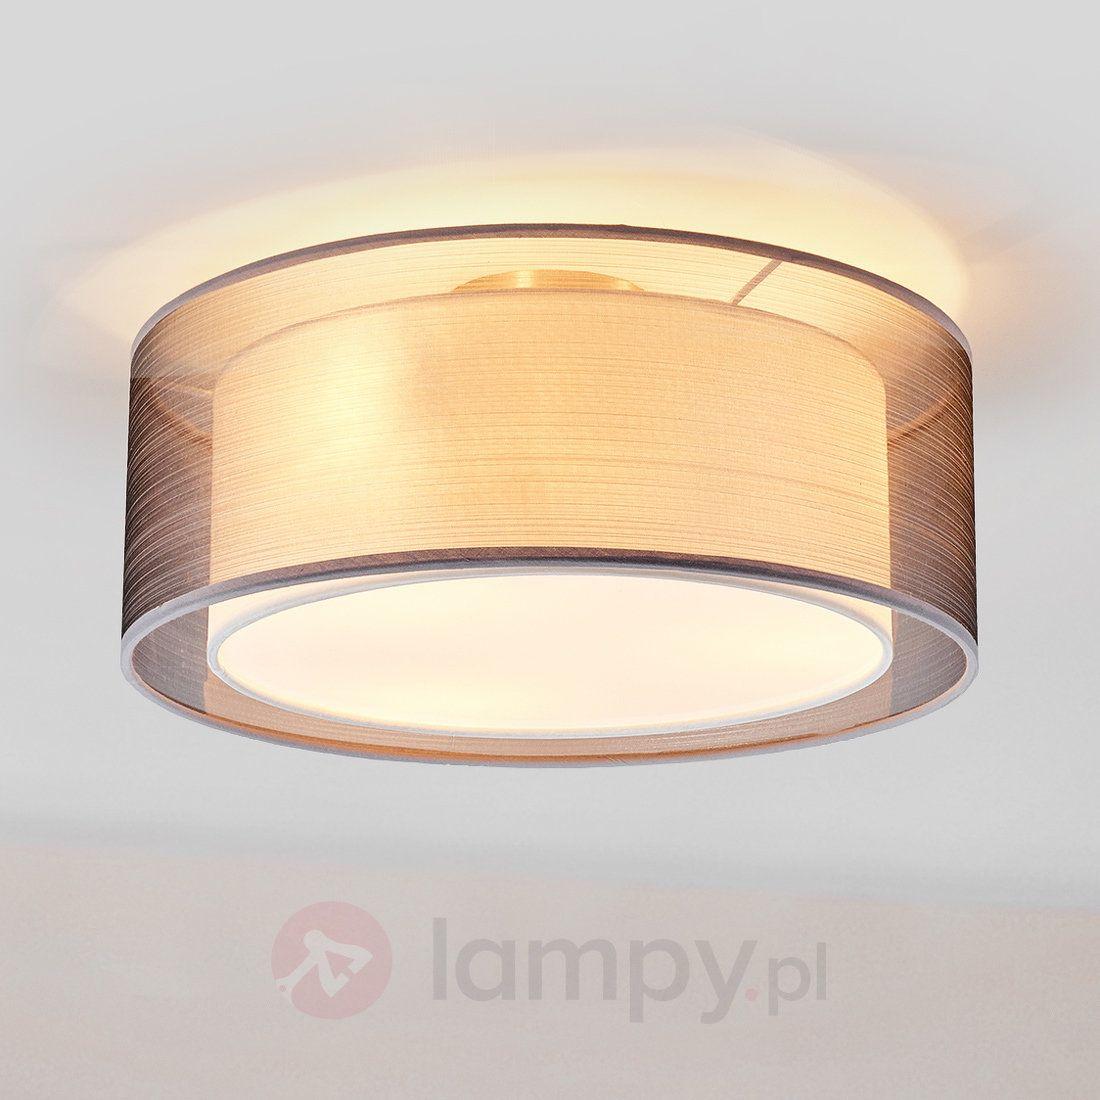 Zimmer string leuchtet ideen materiałowa lampa sufitowa nica szara  lampy  pinterest